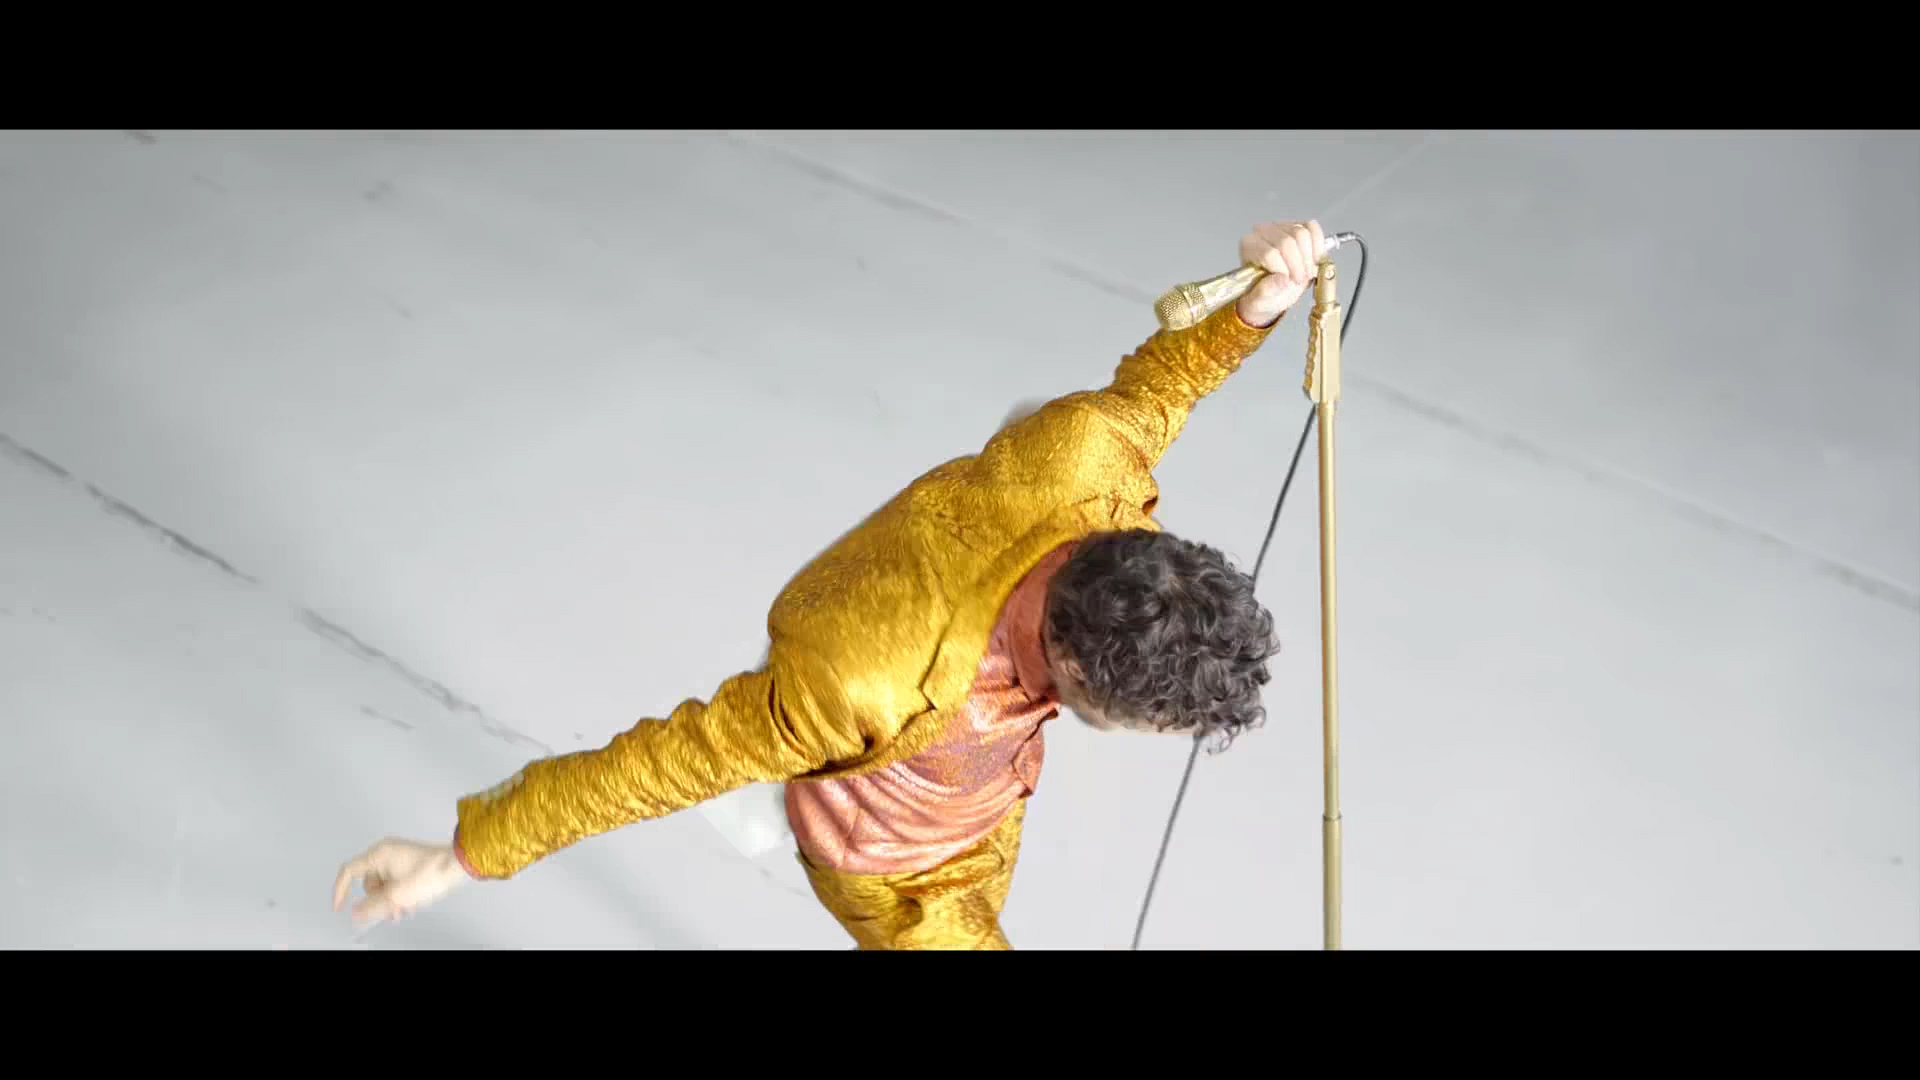 lorenzo-jovanotti-video-musicale-Studio_B19-Viareggio